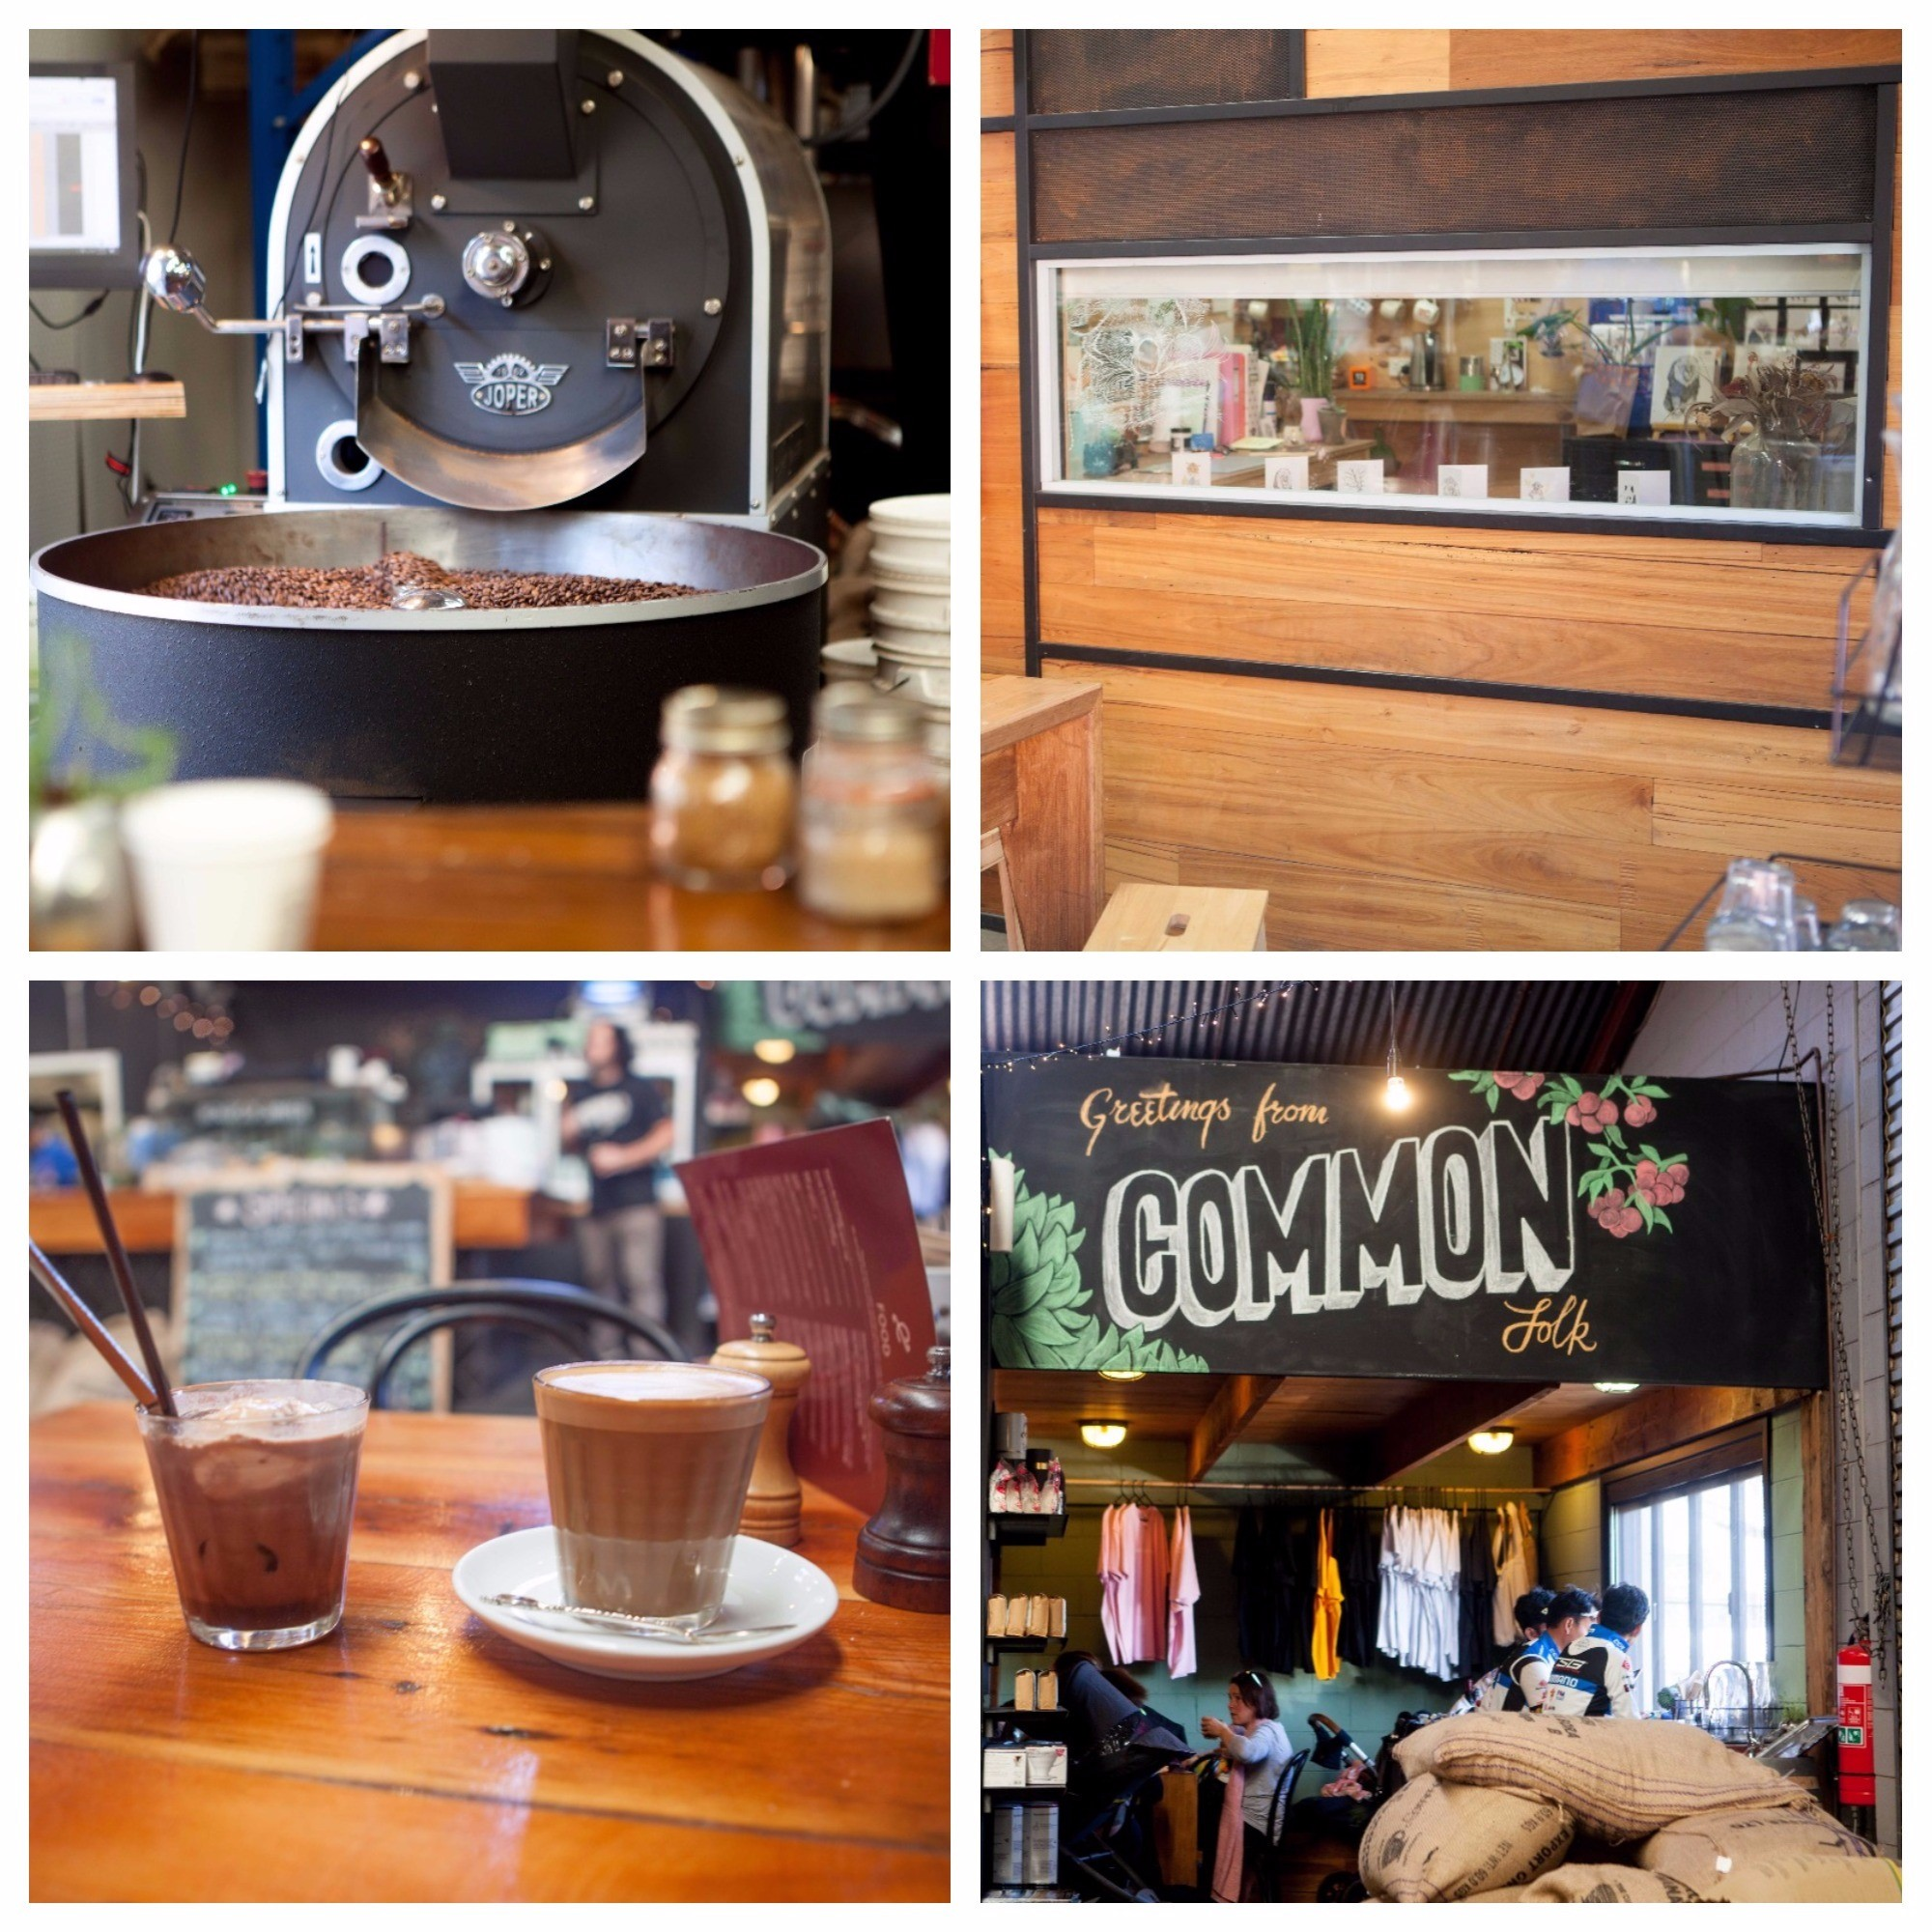 mamma knows south - commonfolk coffee, mornington